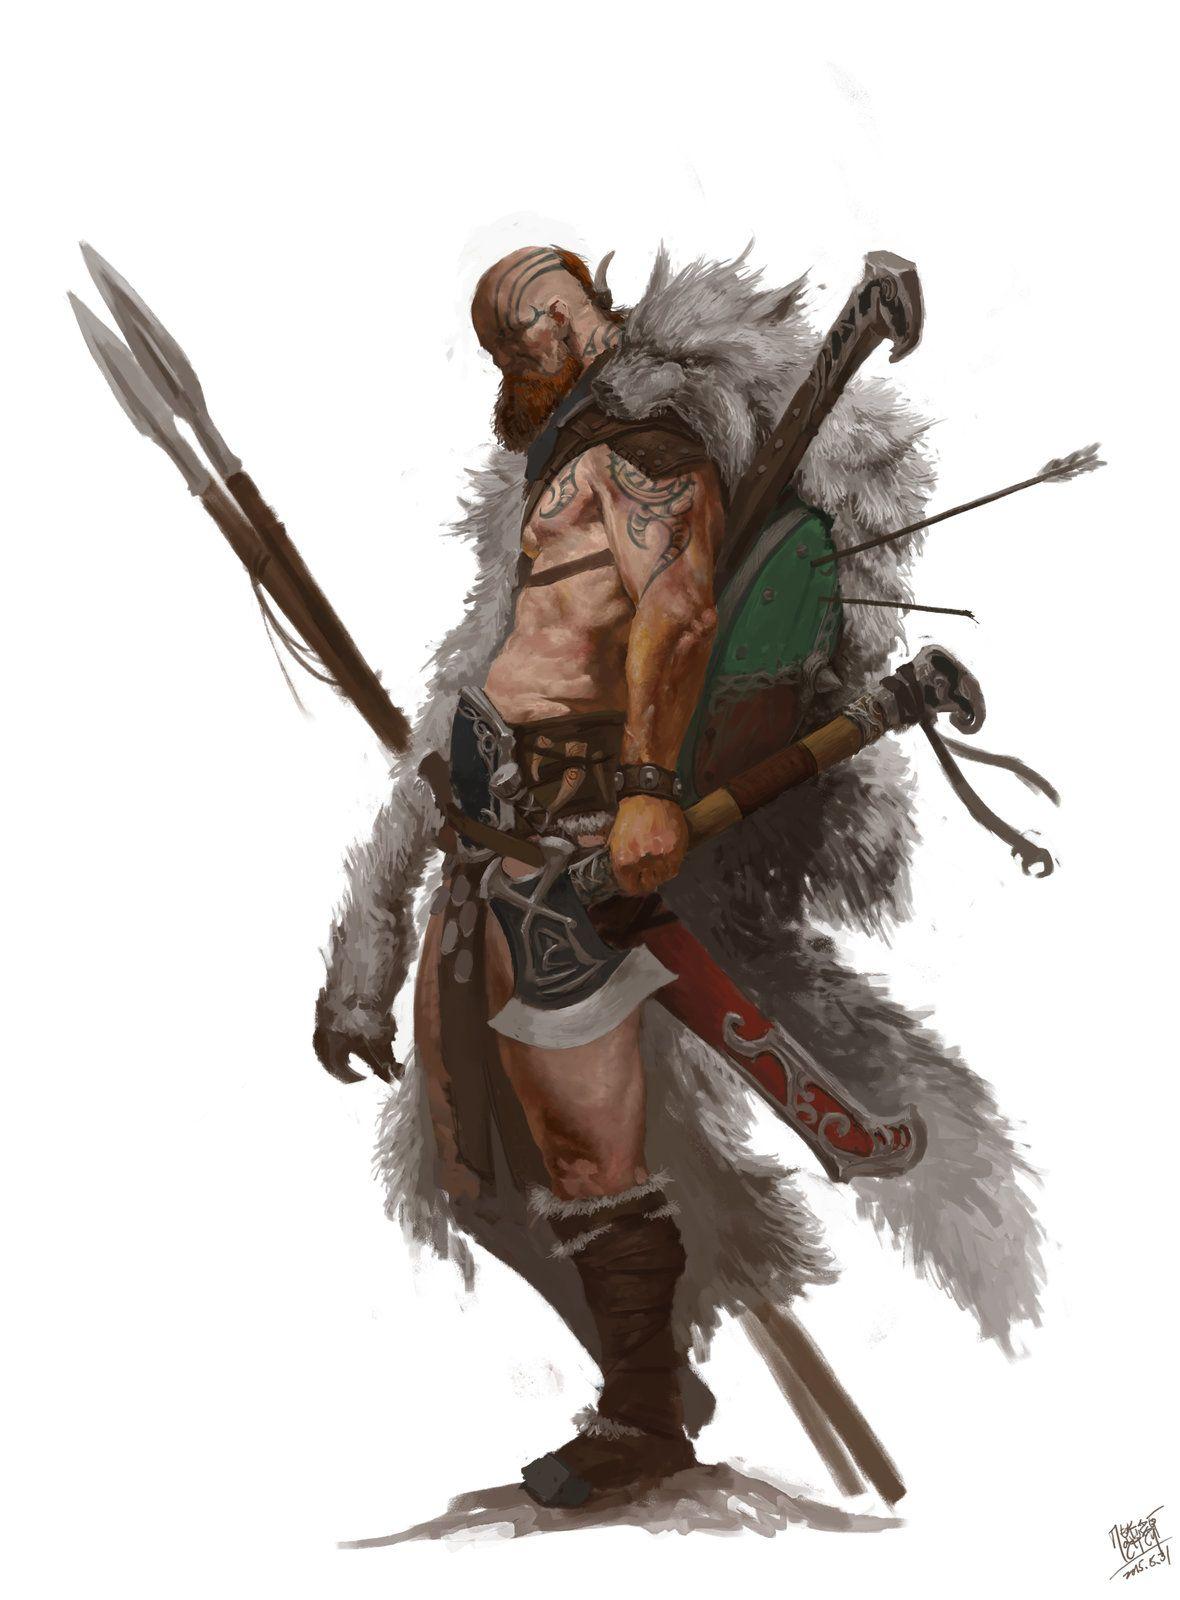 Warrior, NI Yipeng on ArtStation at https://www.artstation ...  Warrior, NI Yip...